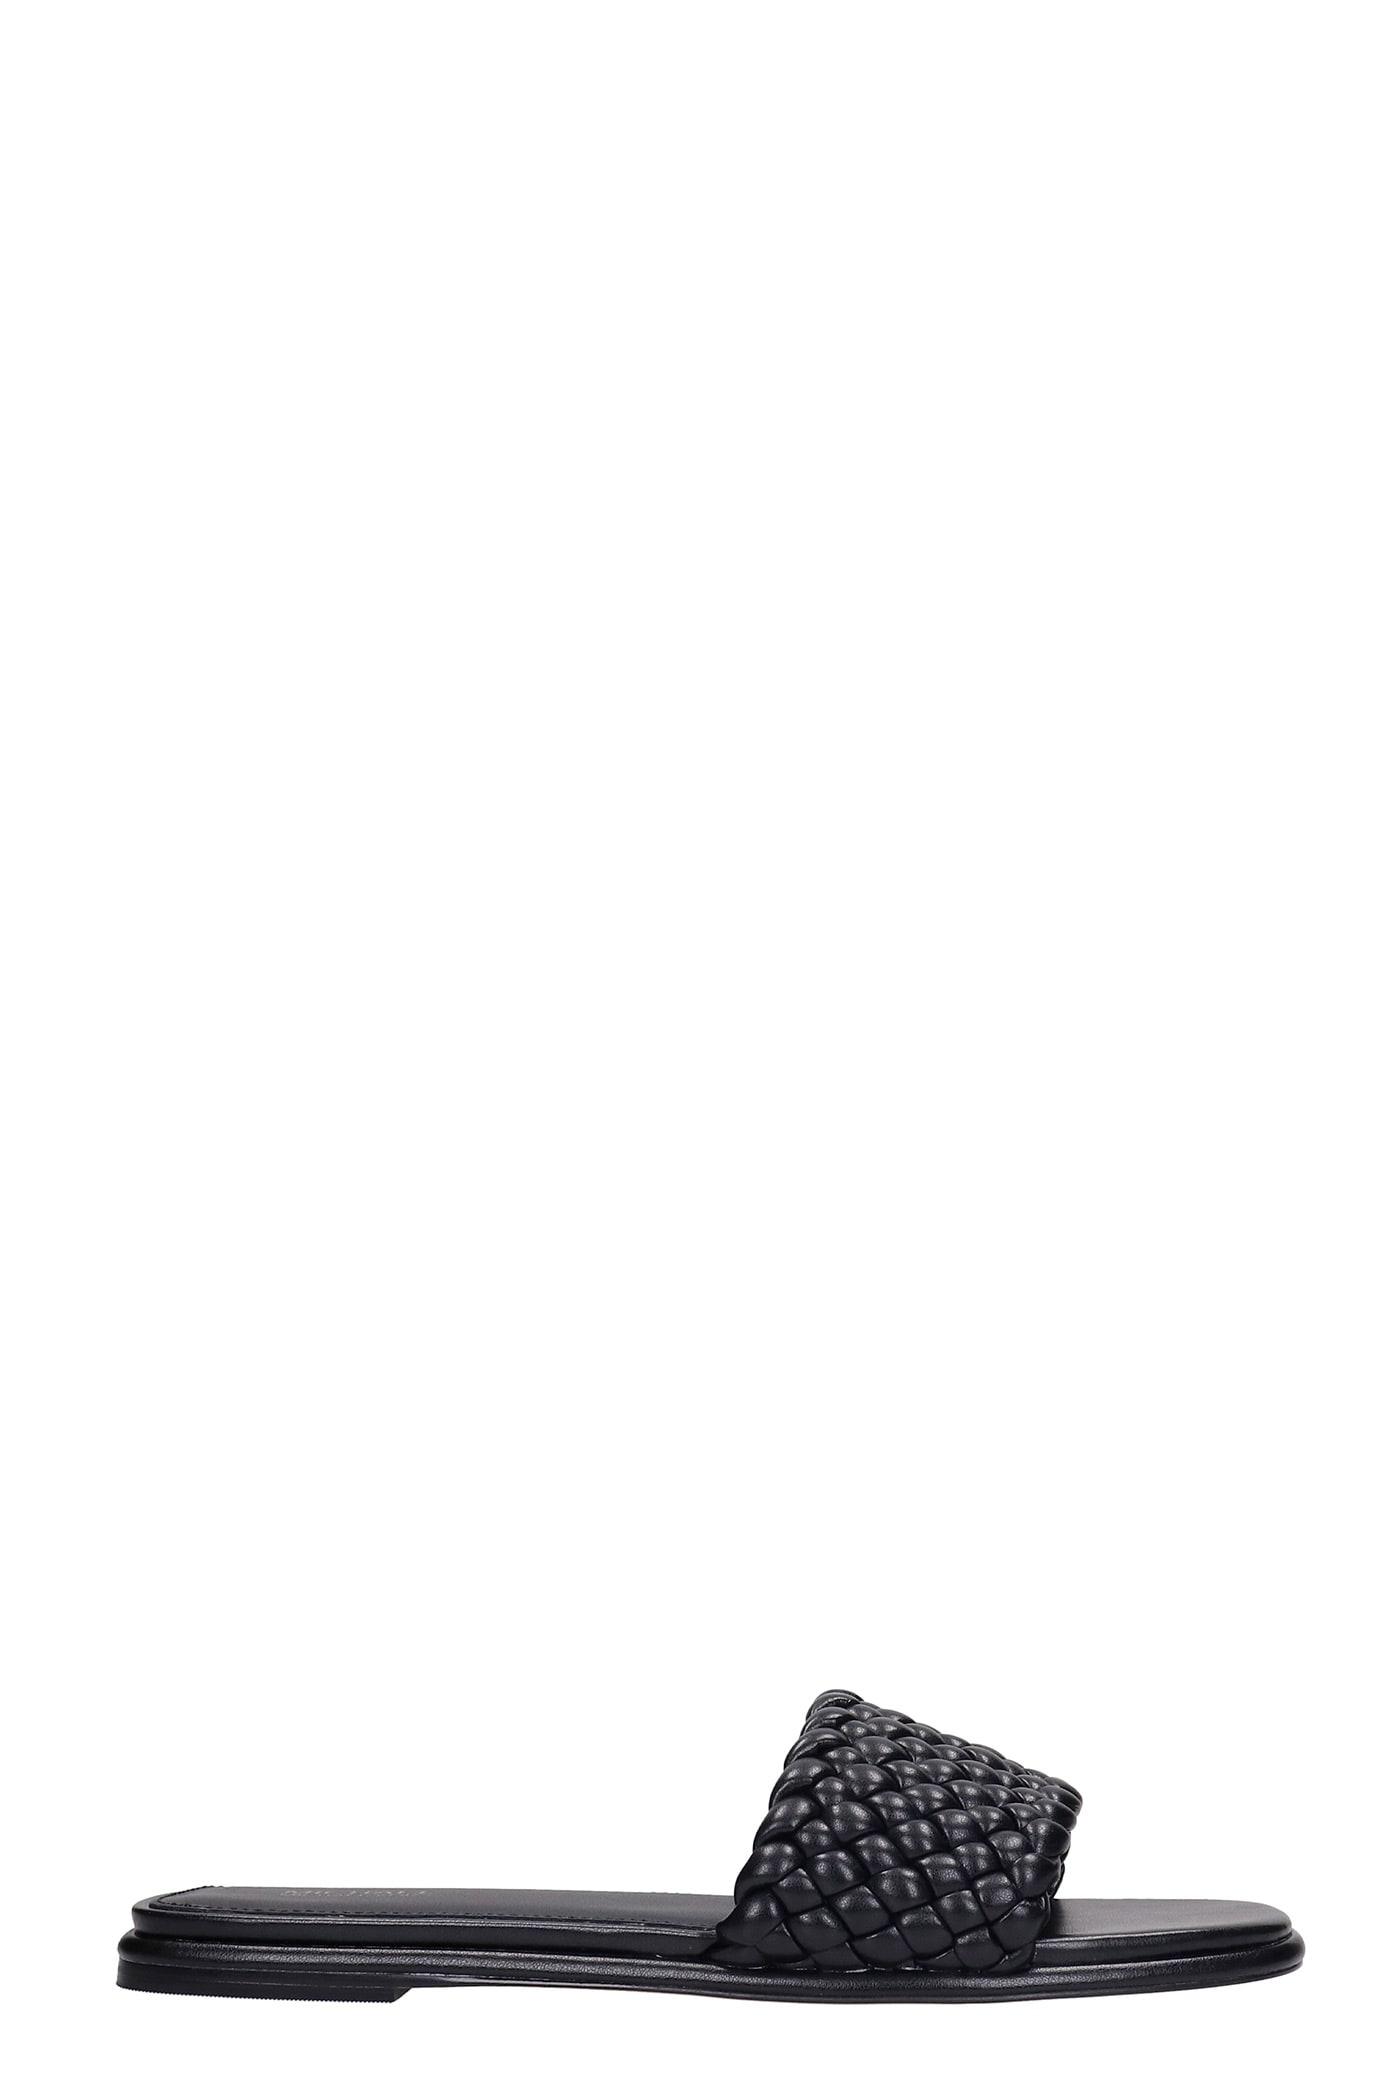 Michael Kors Amelia Flats In Black Leather